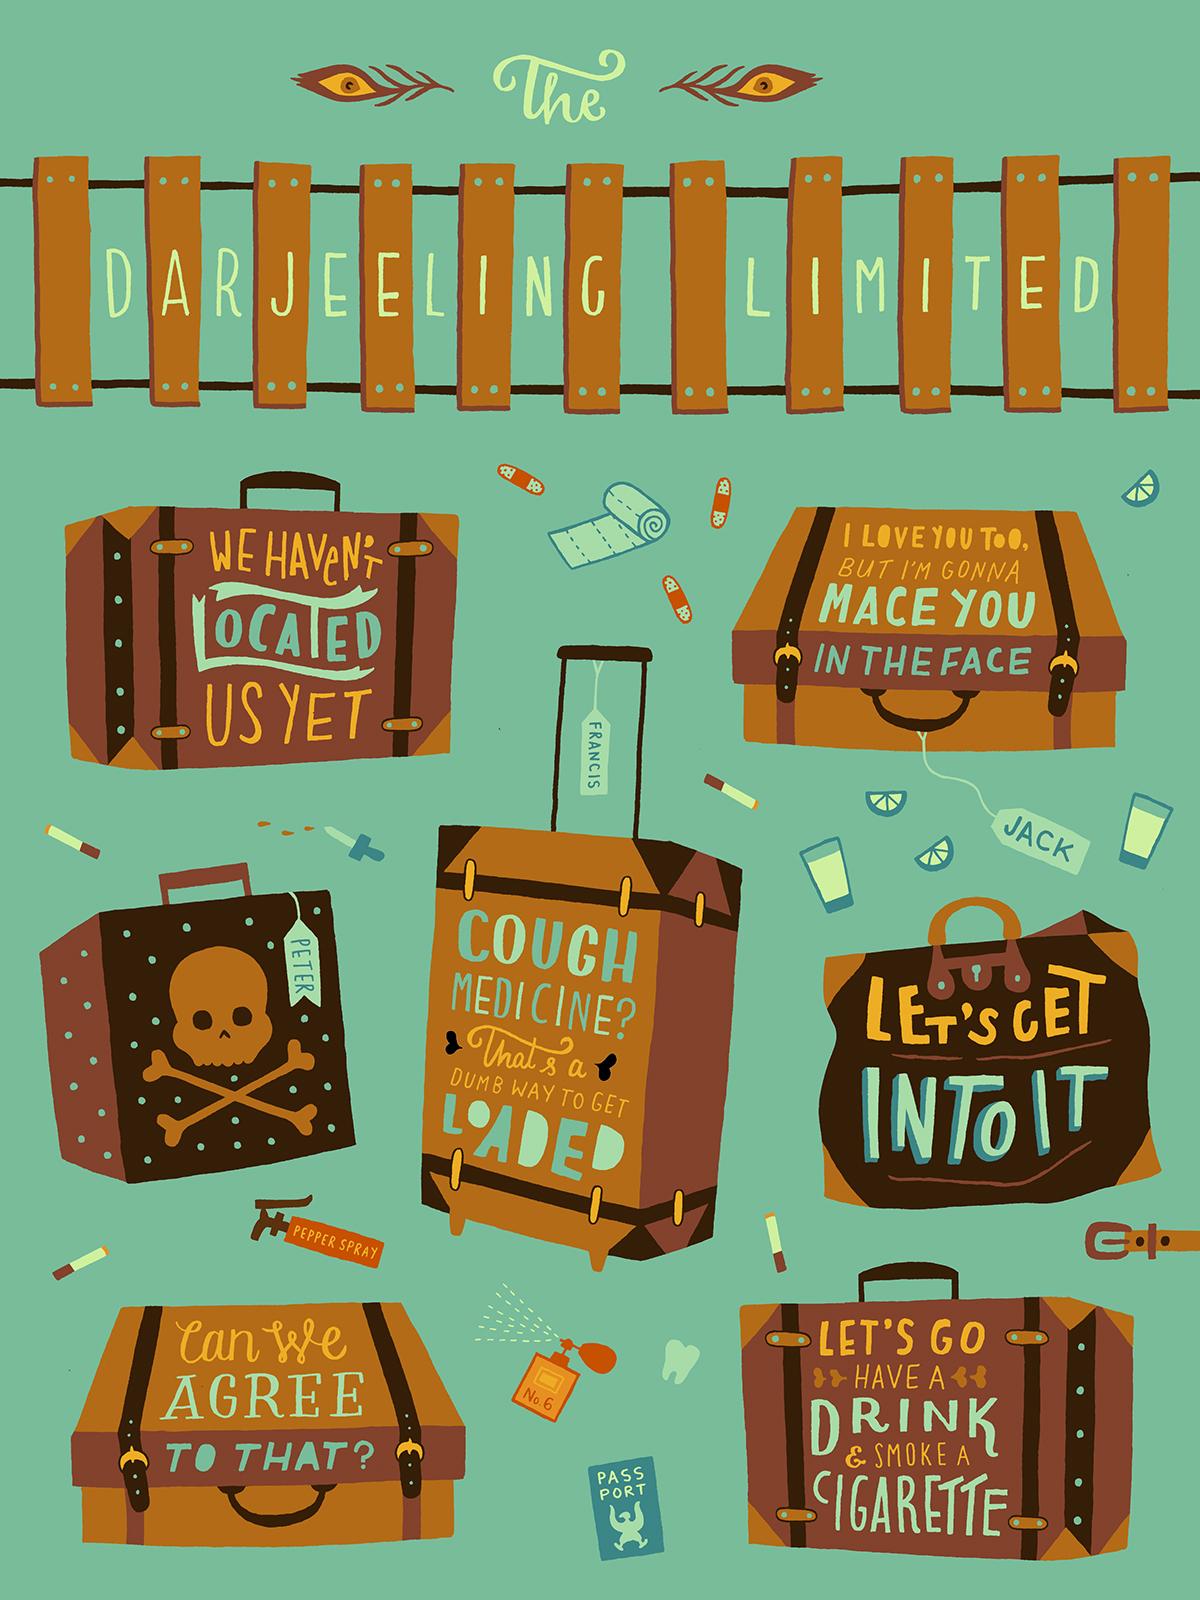 Darjeeling Limited Luggage Graphic Design